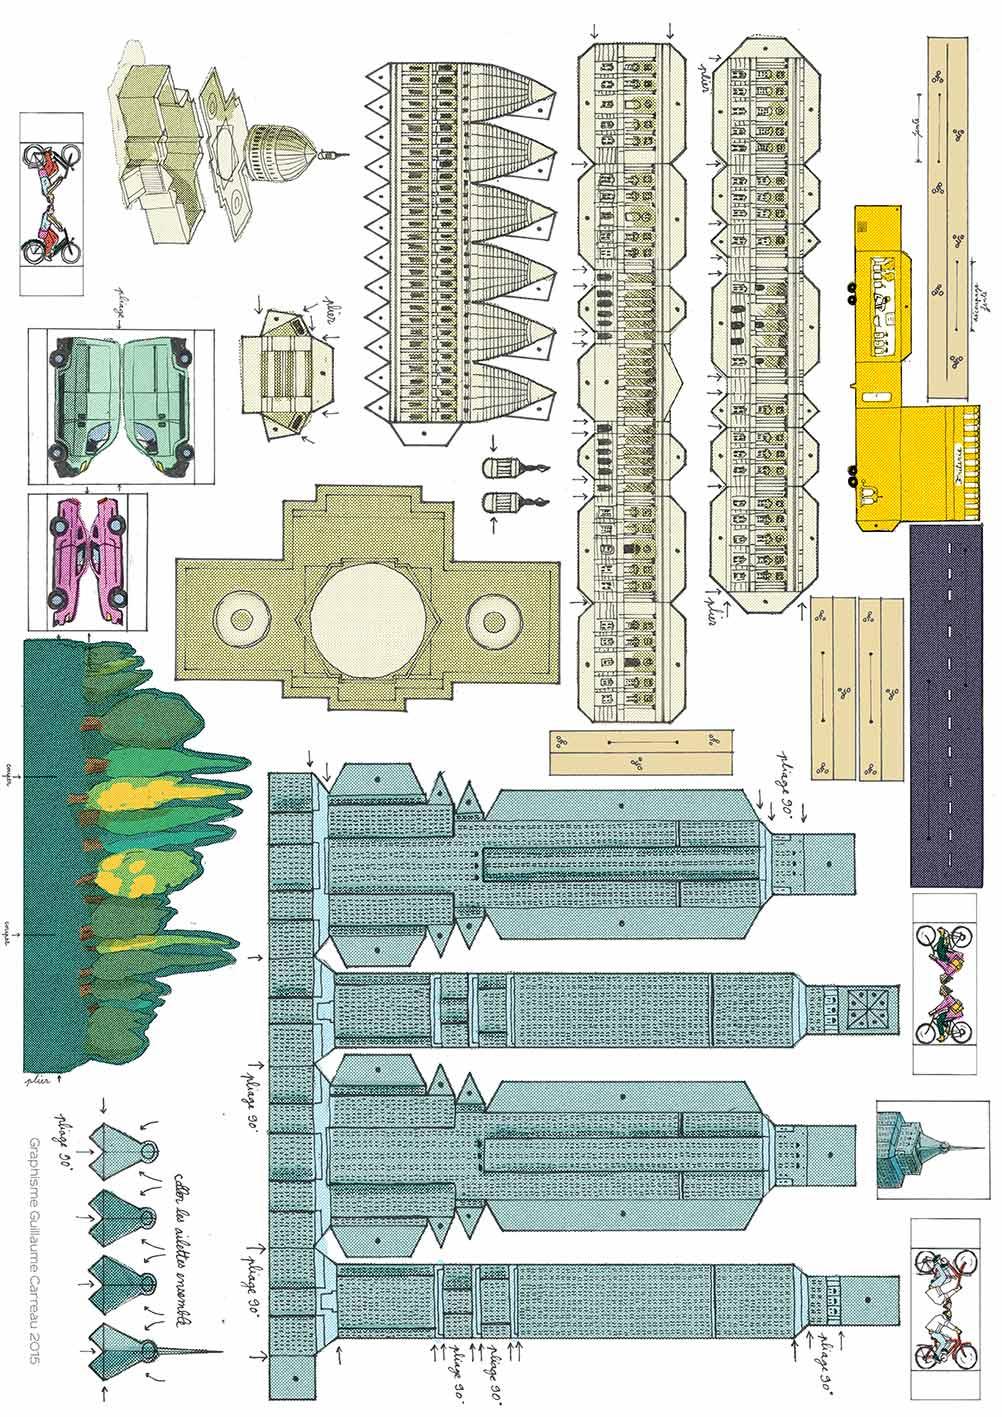 plan-decoupage-tour-friterie-musee-aplatie